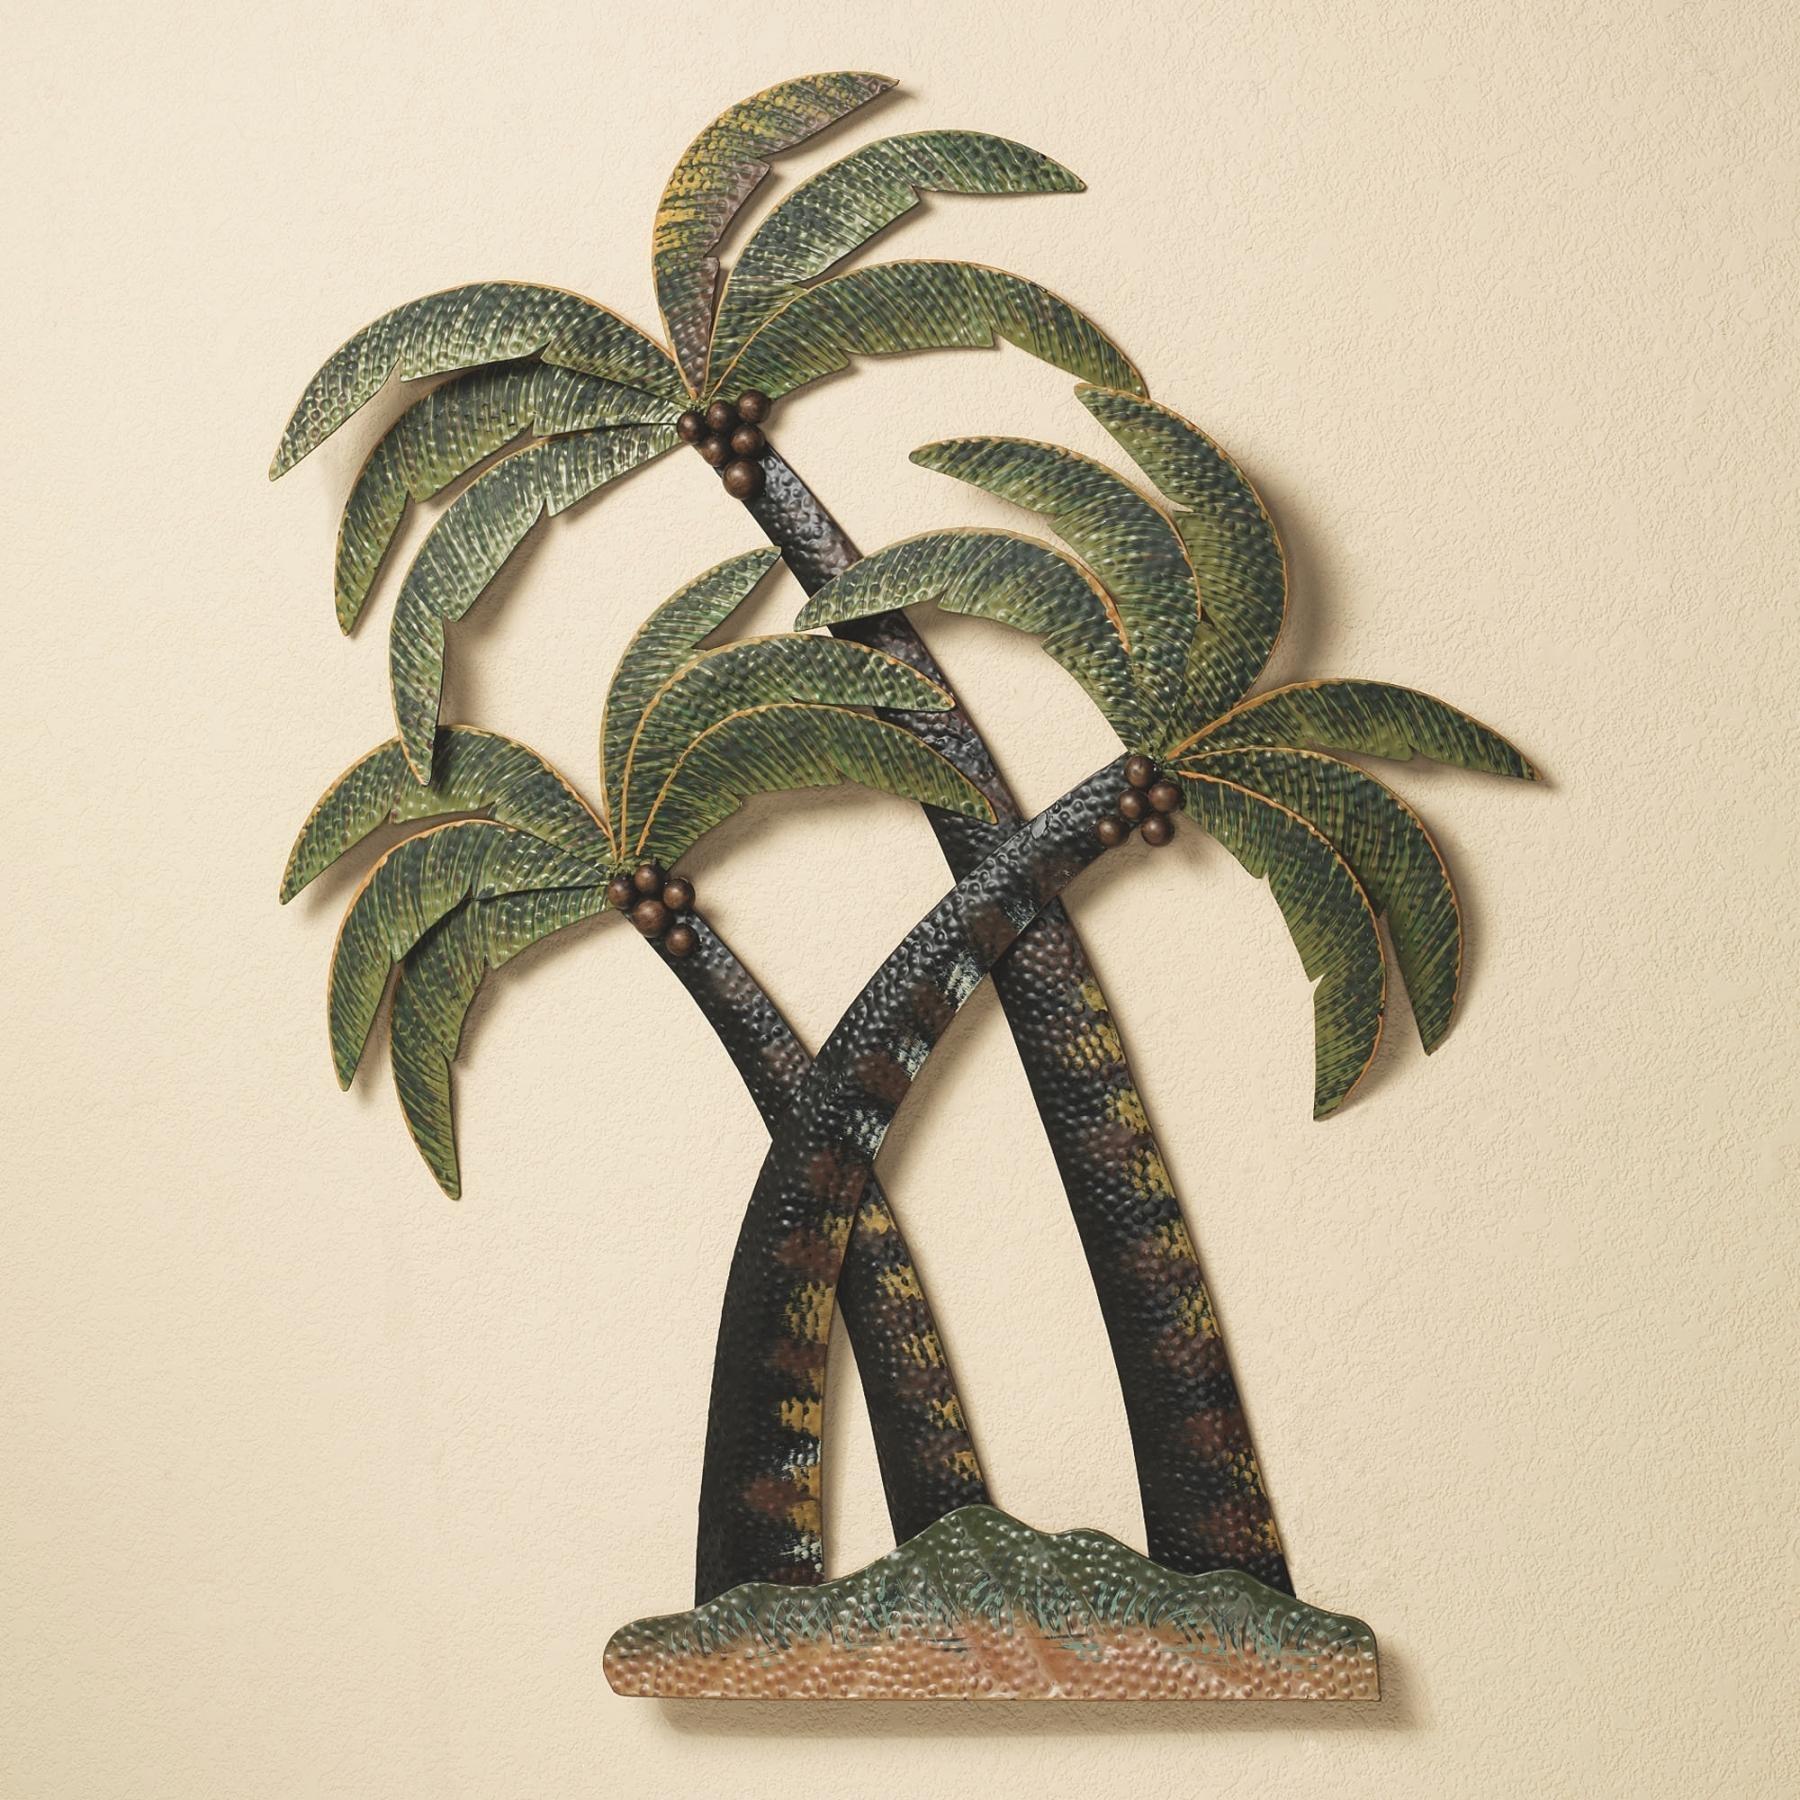 Wall Art Designs: Palm Tree Wall Art Palm Tree Bathroom Palm Trees Intended For Palm Tree Metal Wall Art (View 4 of 20)